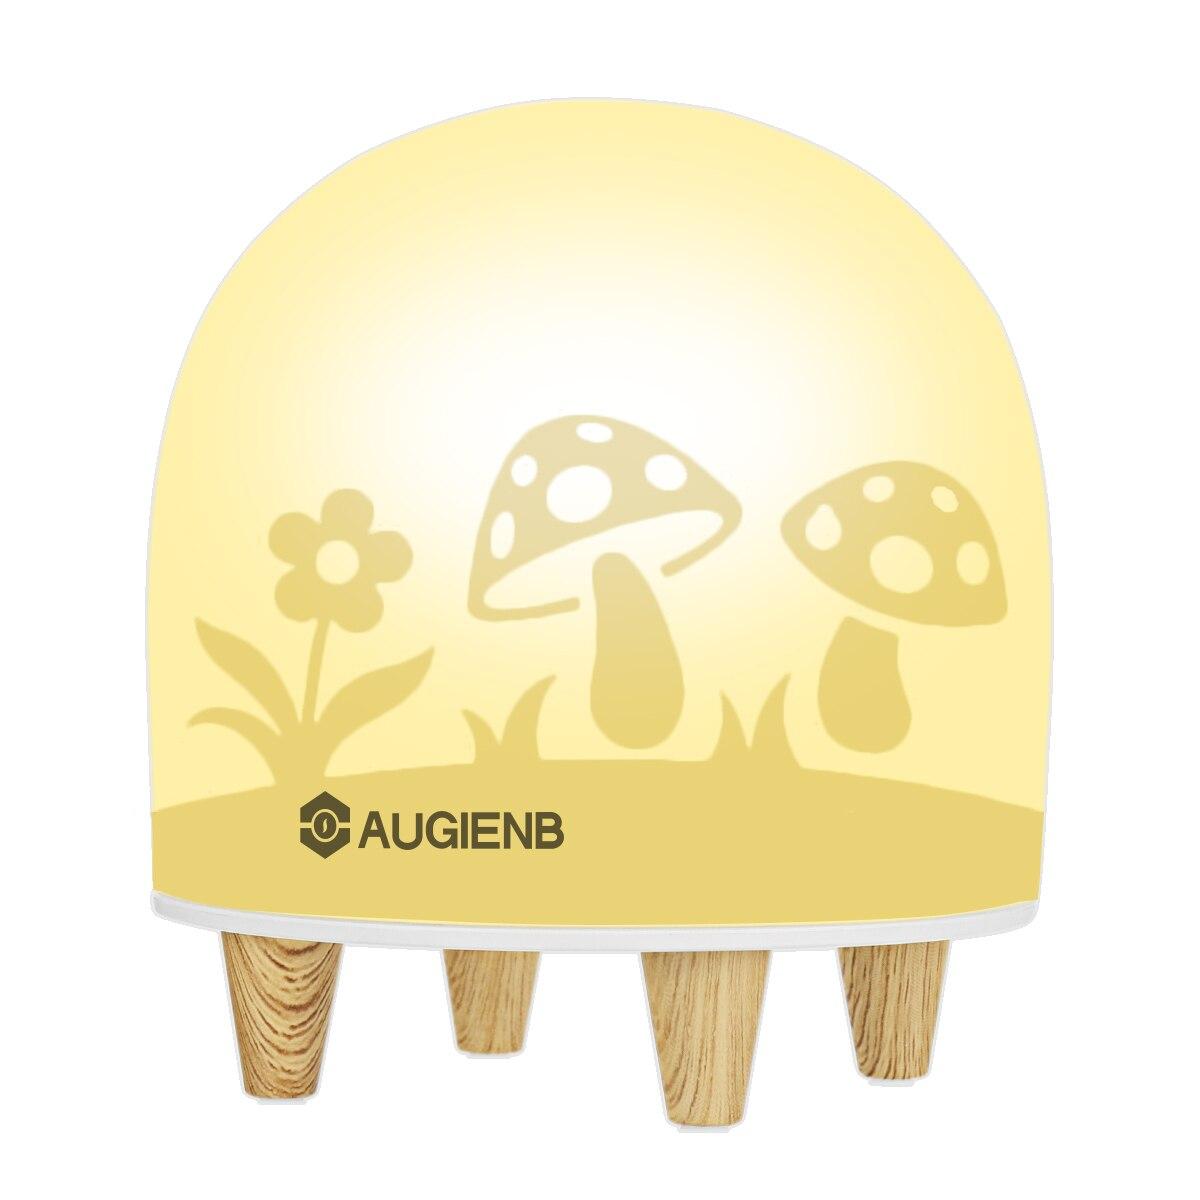 Augienleb Night Light Portable Silicone Eye Caring Nursery